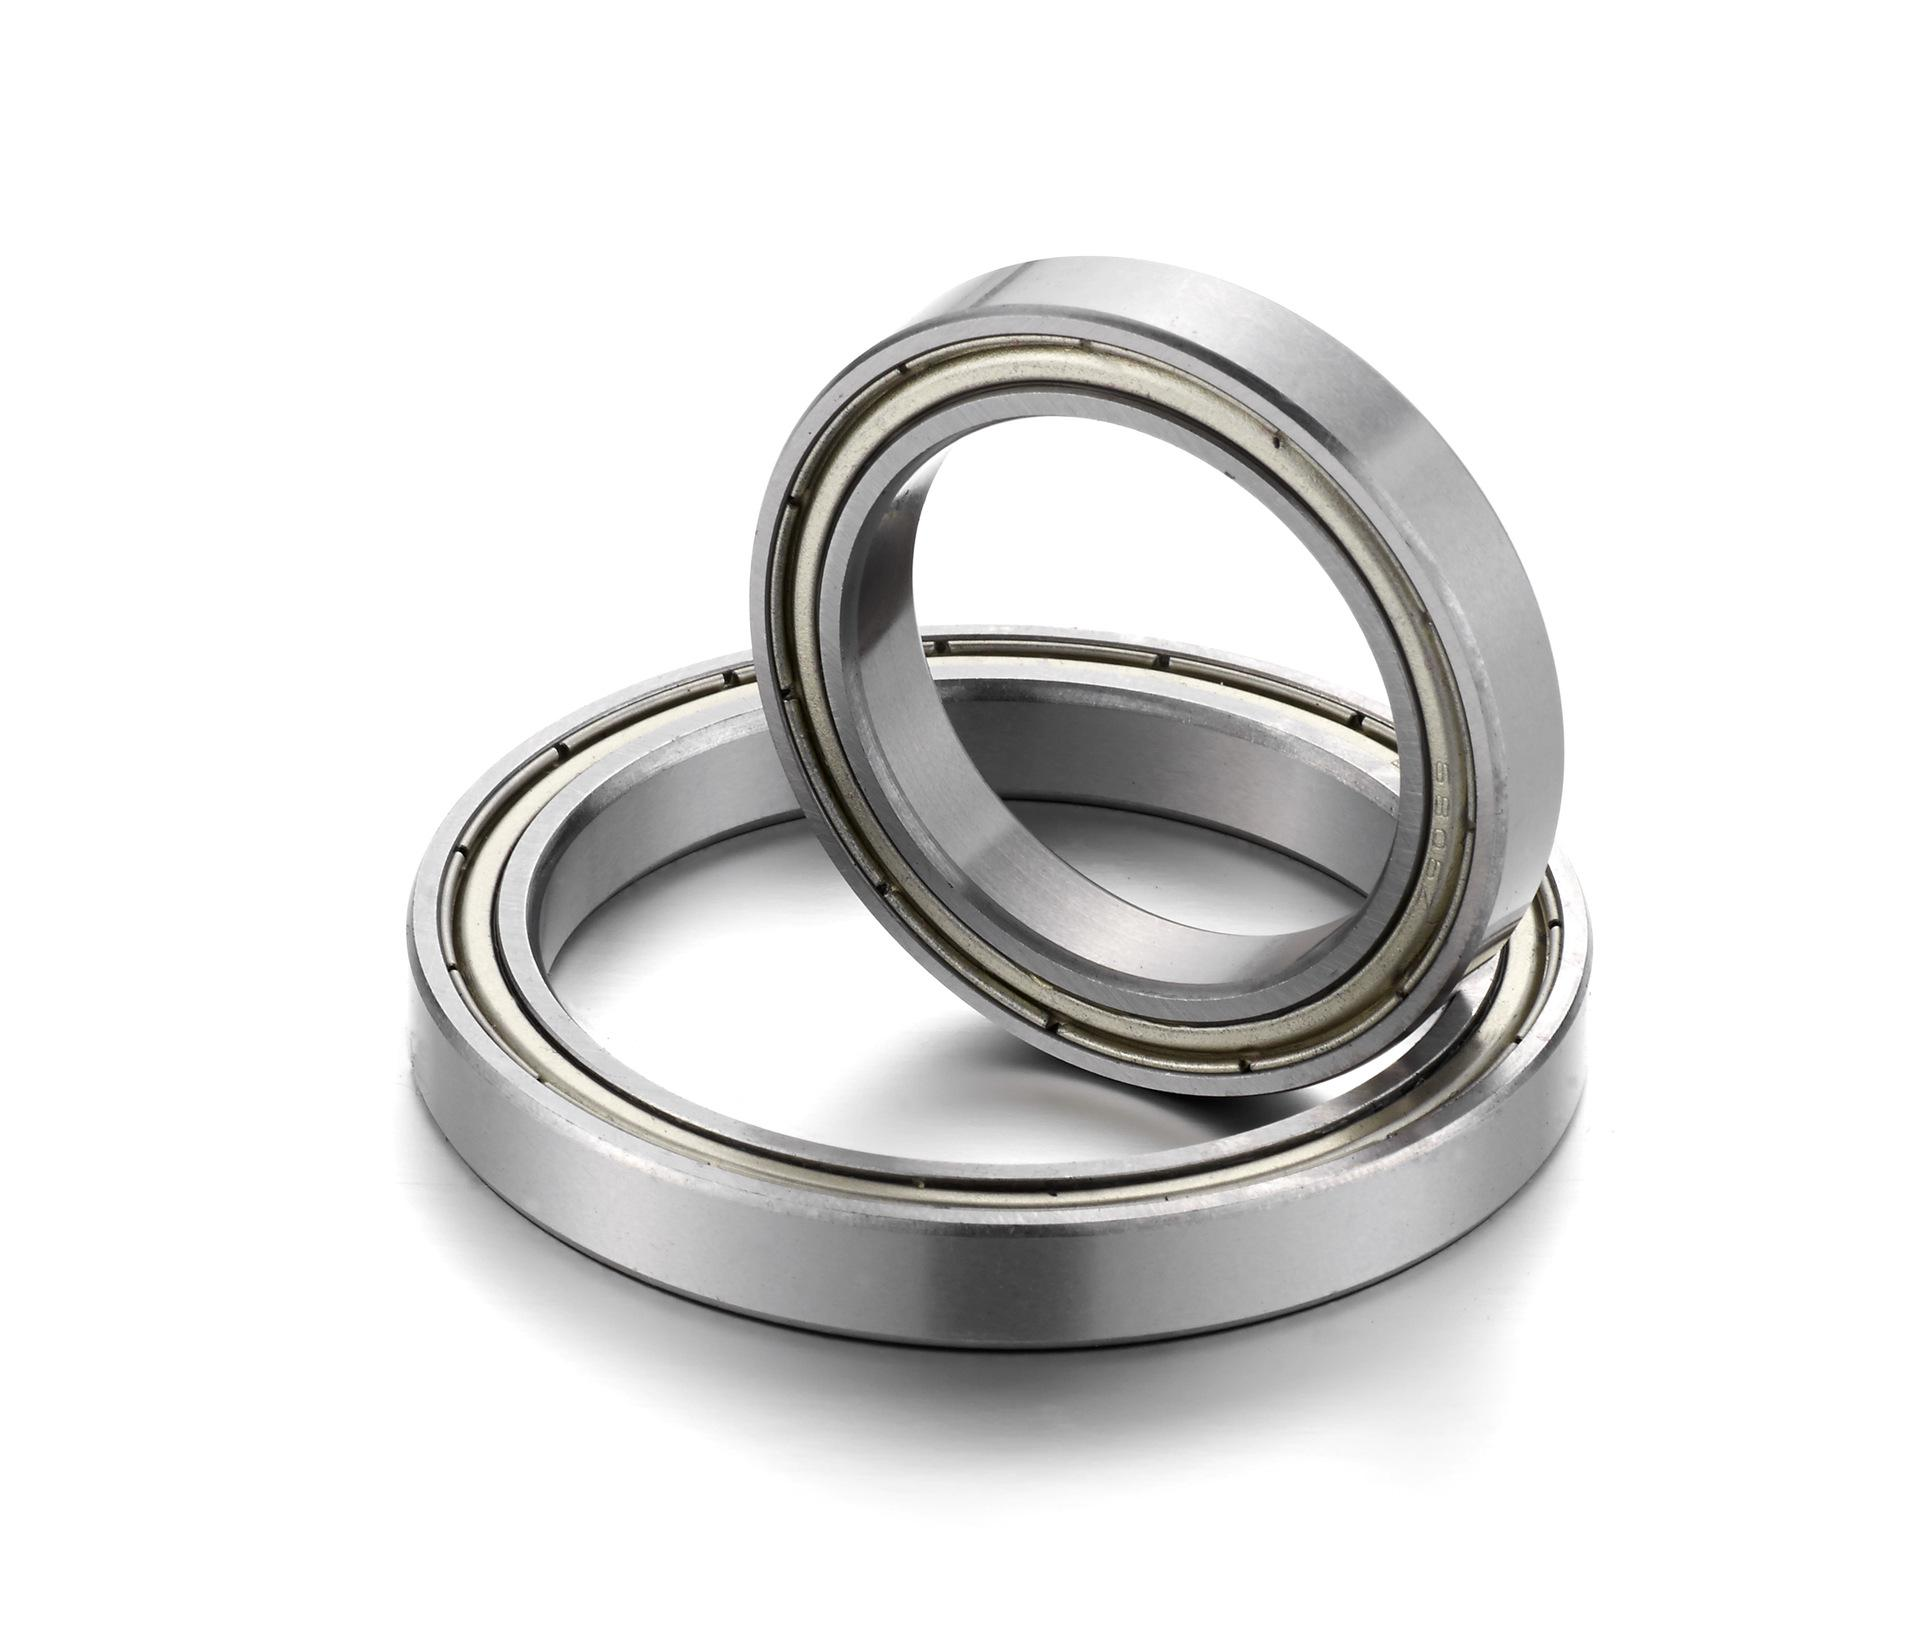 6917ZZ ABEC-1 (2PCS) 85x120x18MM Metric Thin Section Bearings 61917ZZ 6917ZZ 1pcs 71822 71822cd p4 7822 110x140x16 mochu thin walled miniature angular contact bearings speed spindle bearings cnc abec 7